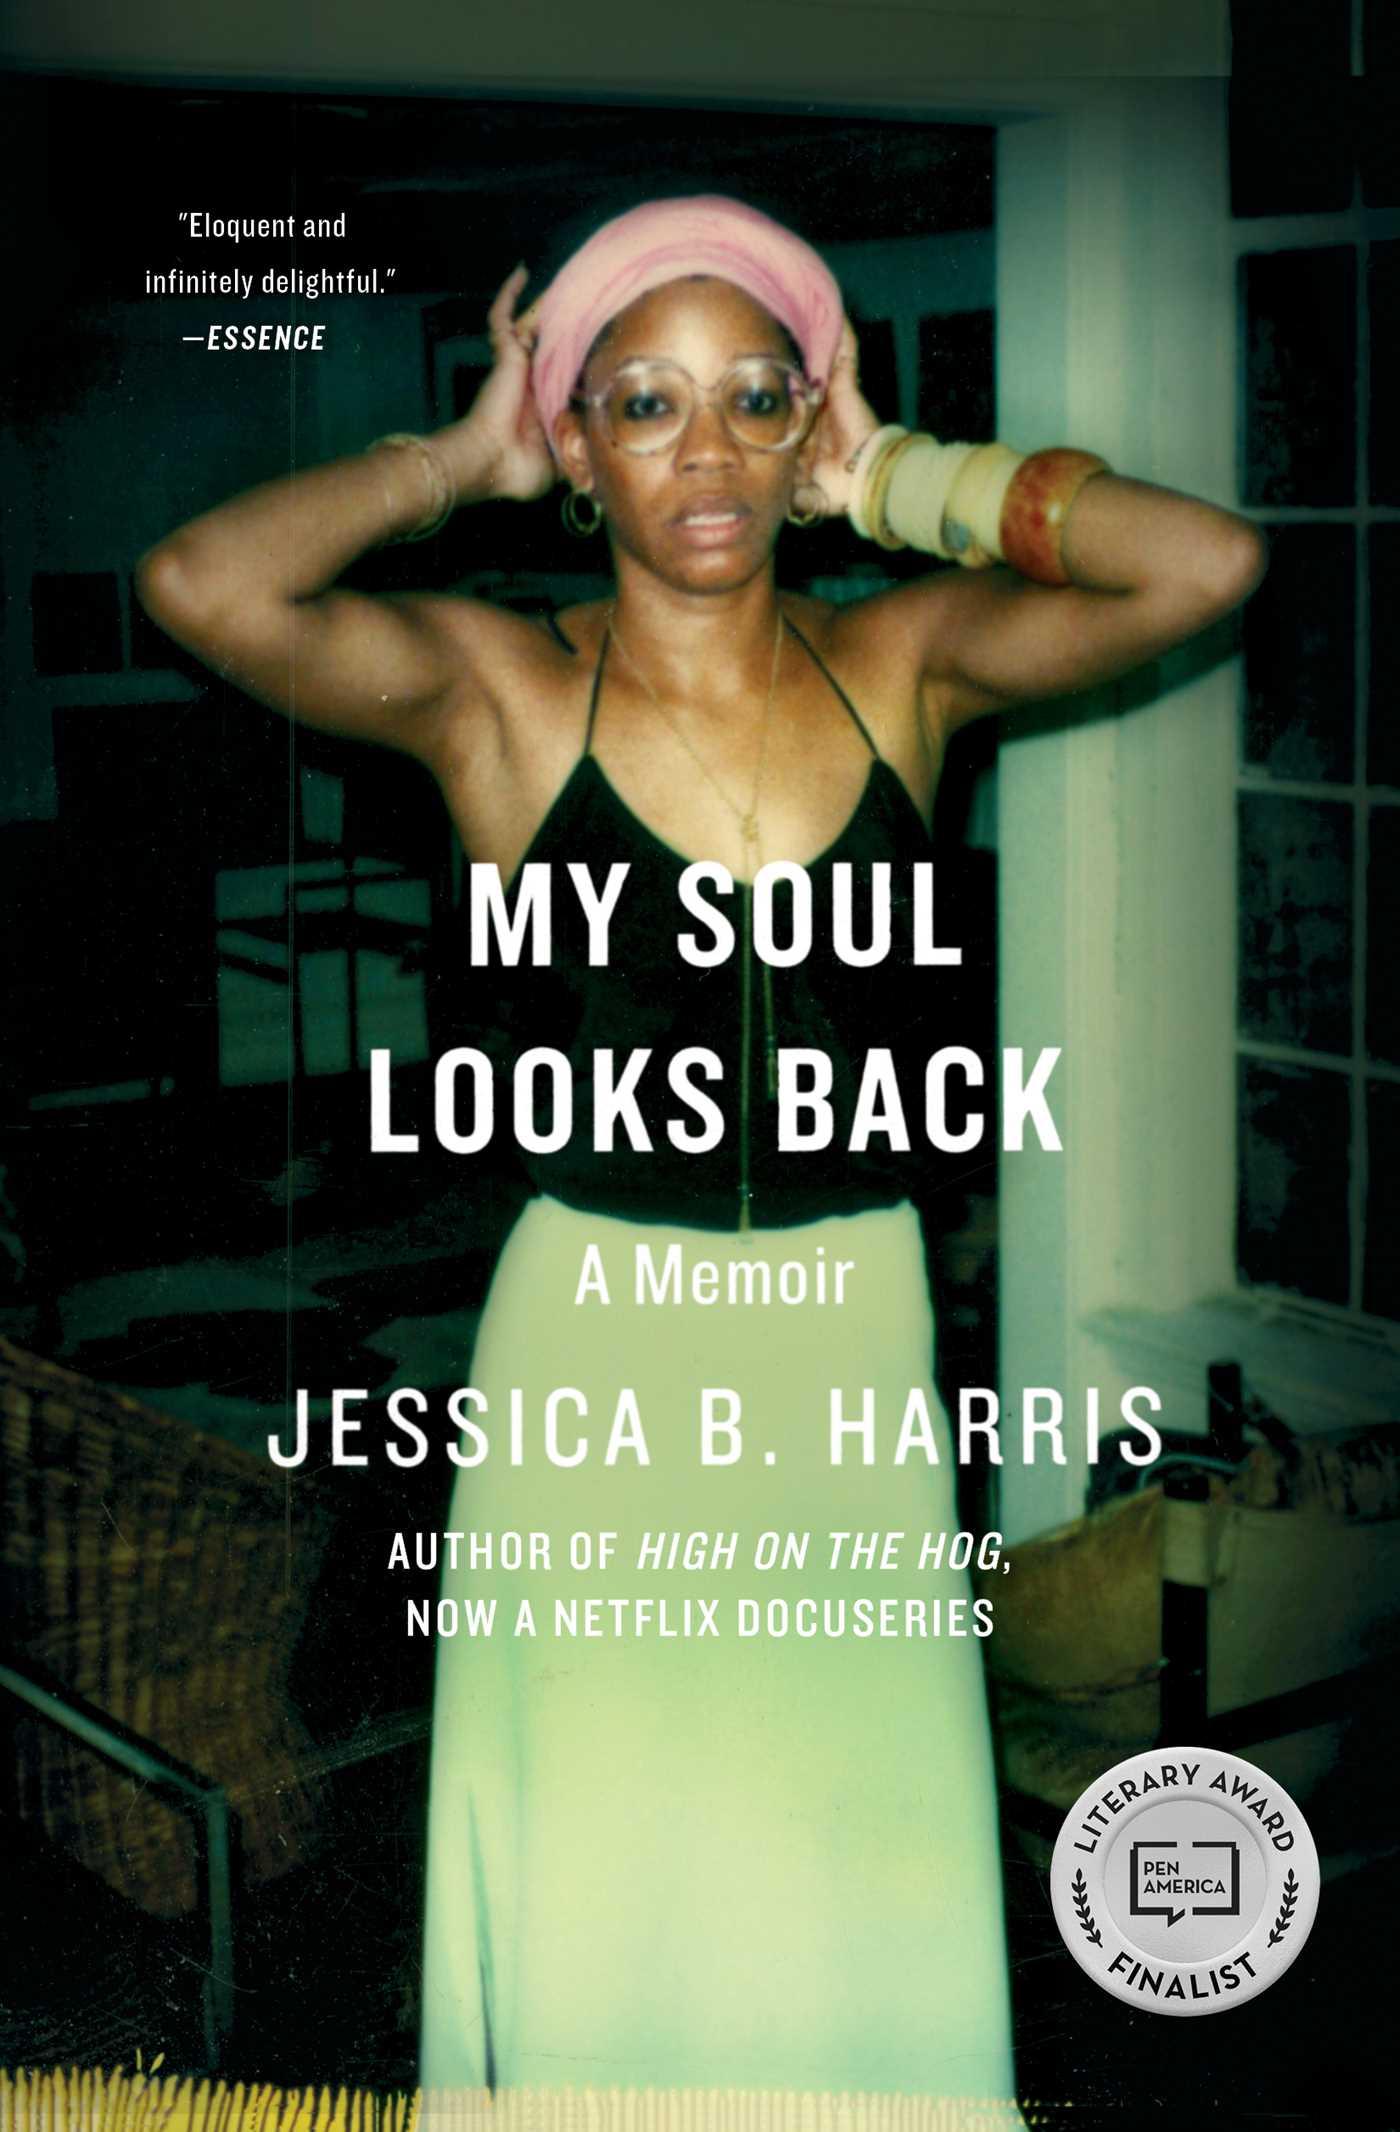 My soul looks back 9781501125928 hr